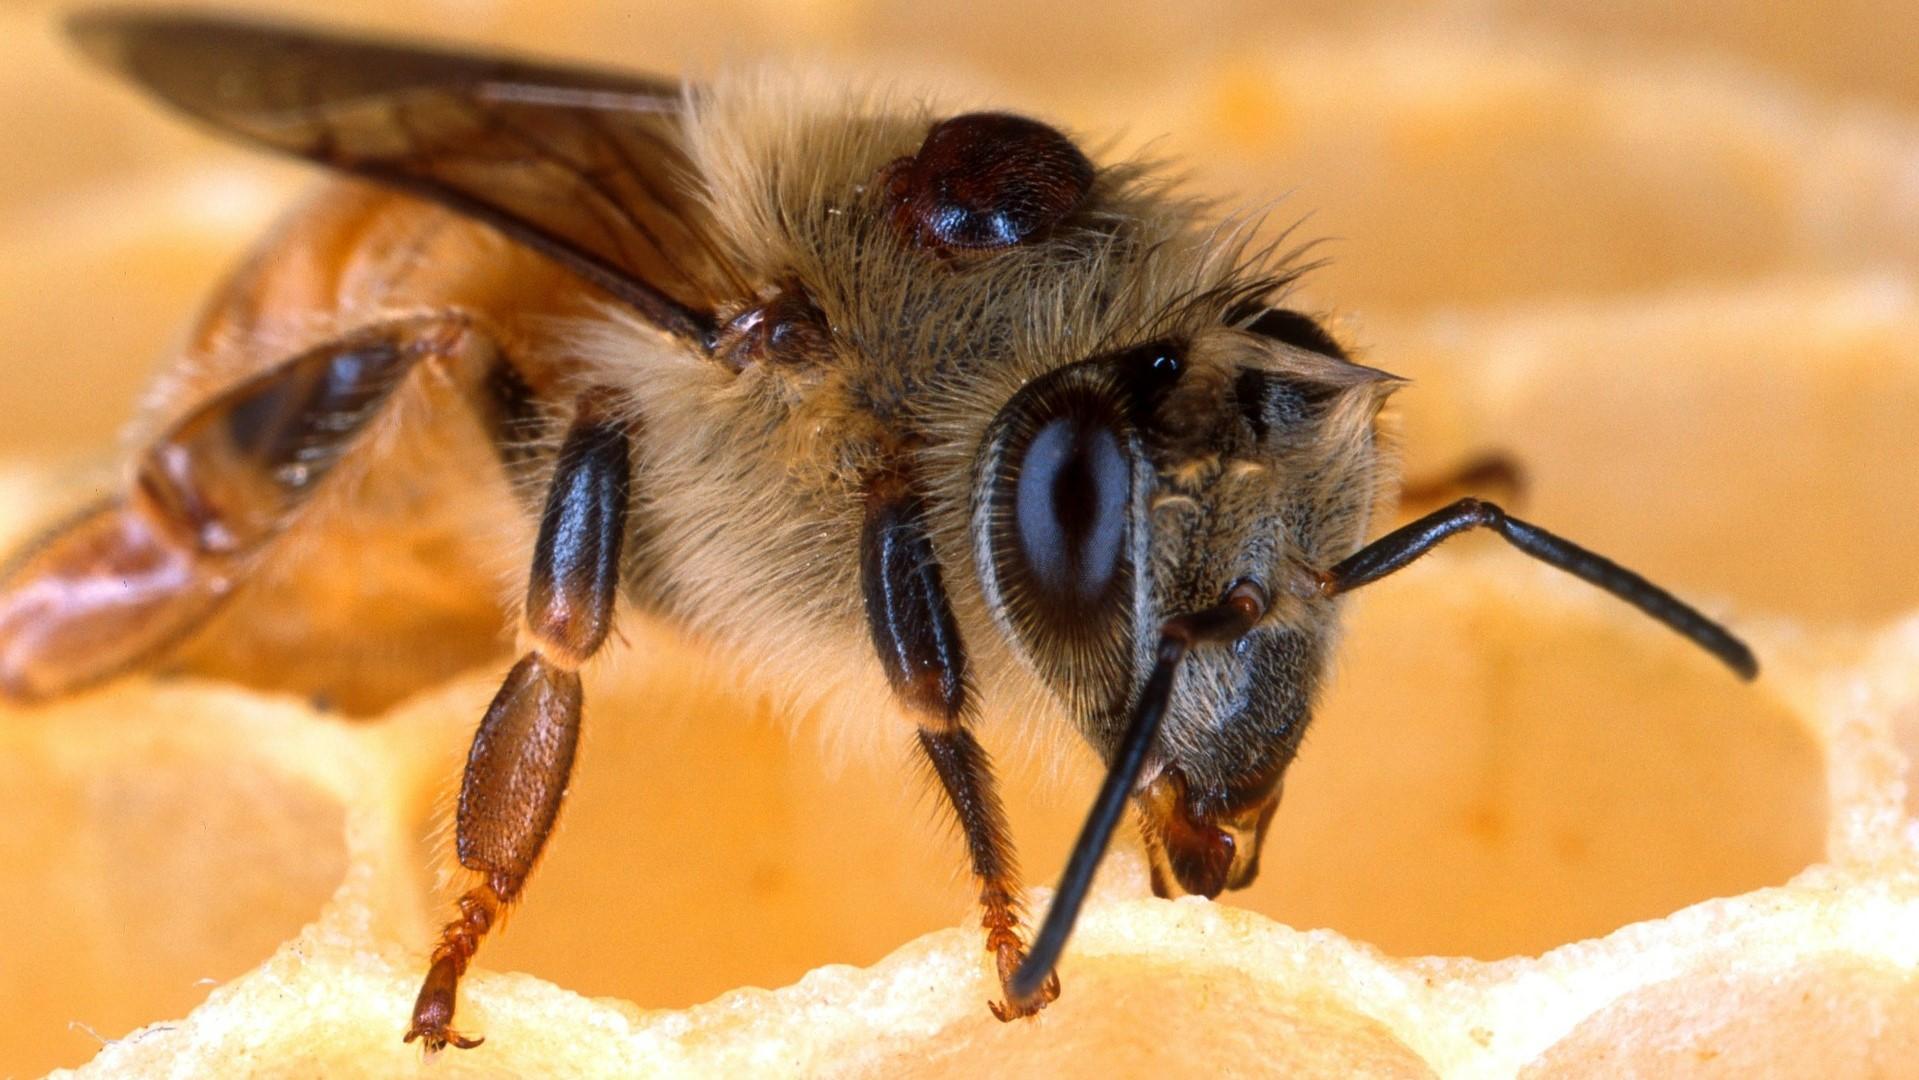 Attract Bees - Attract honey bees - honey bee 2